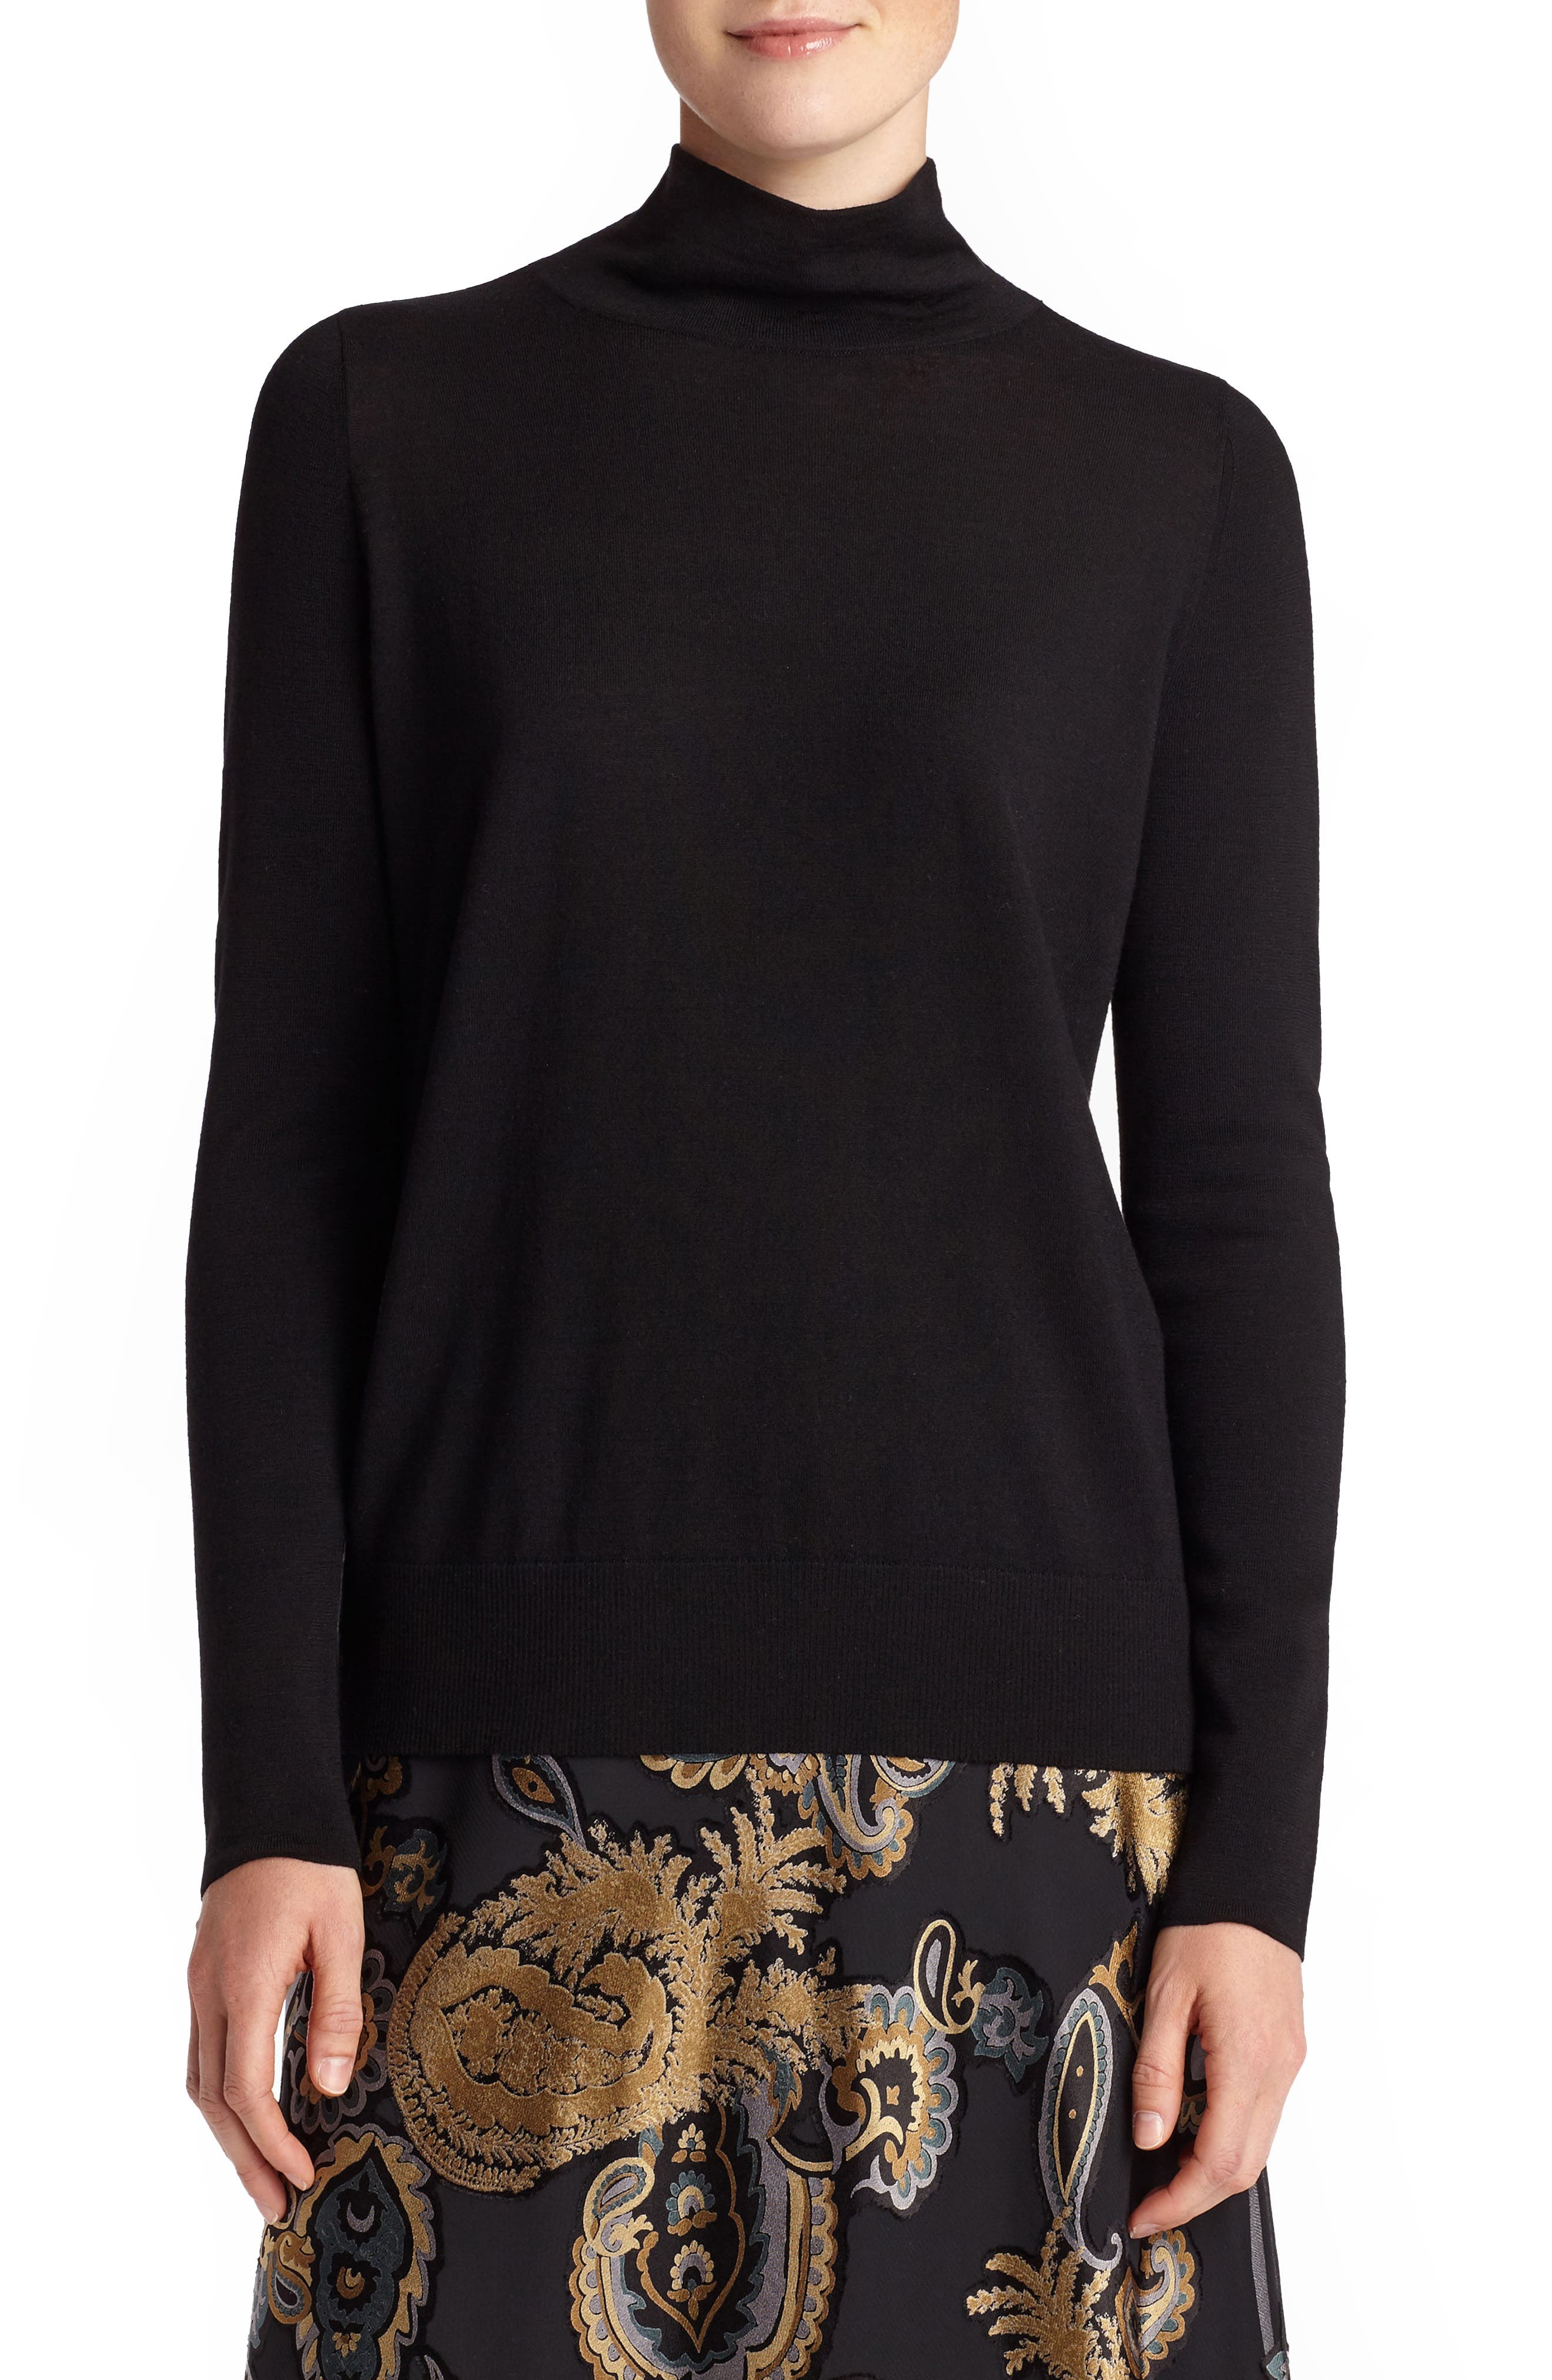 Lafayette 148 New York Merino Wool Modern Turtleneck Sweater, Black